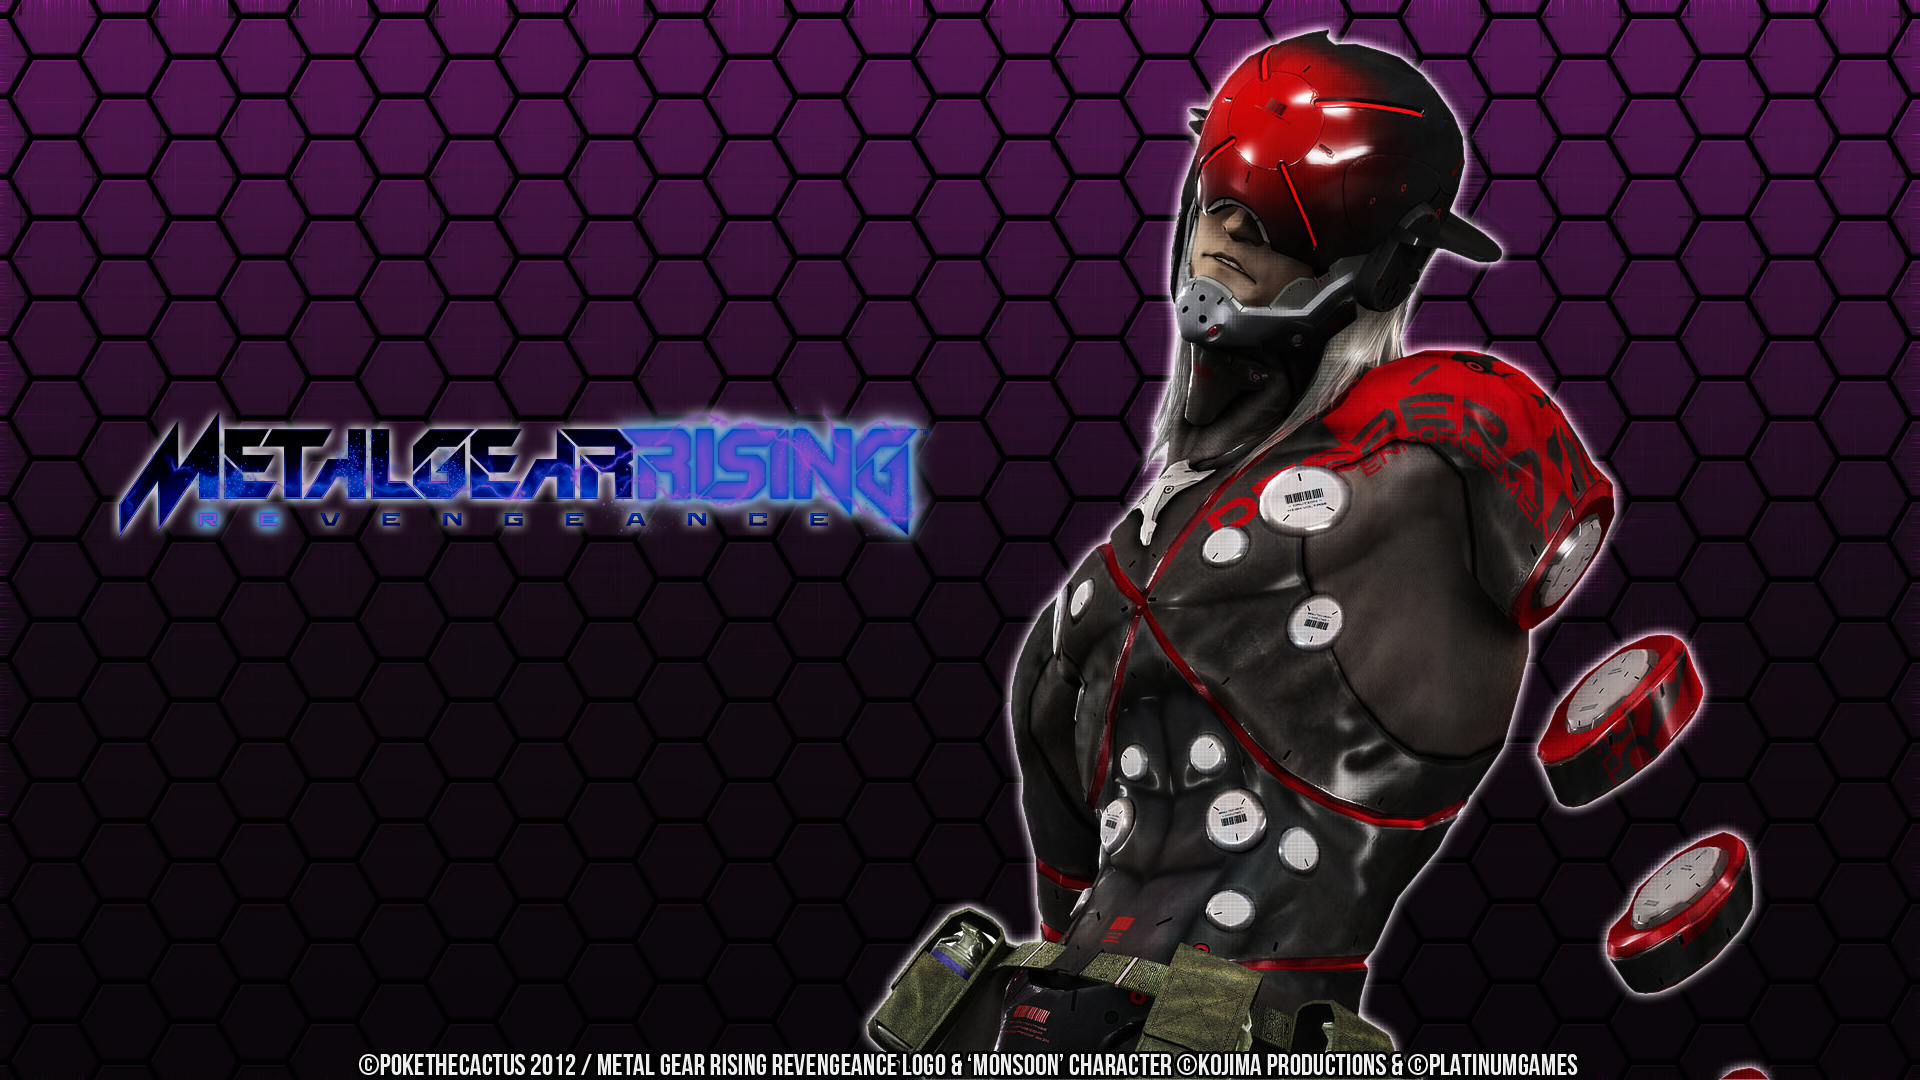 Metal Gear Rising Monsoon Wallpaper By Pokethecactus On